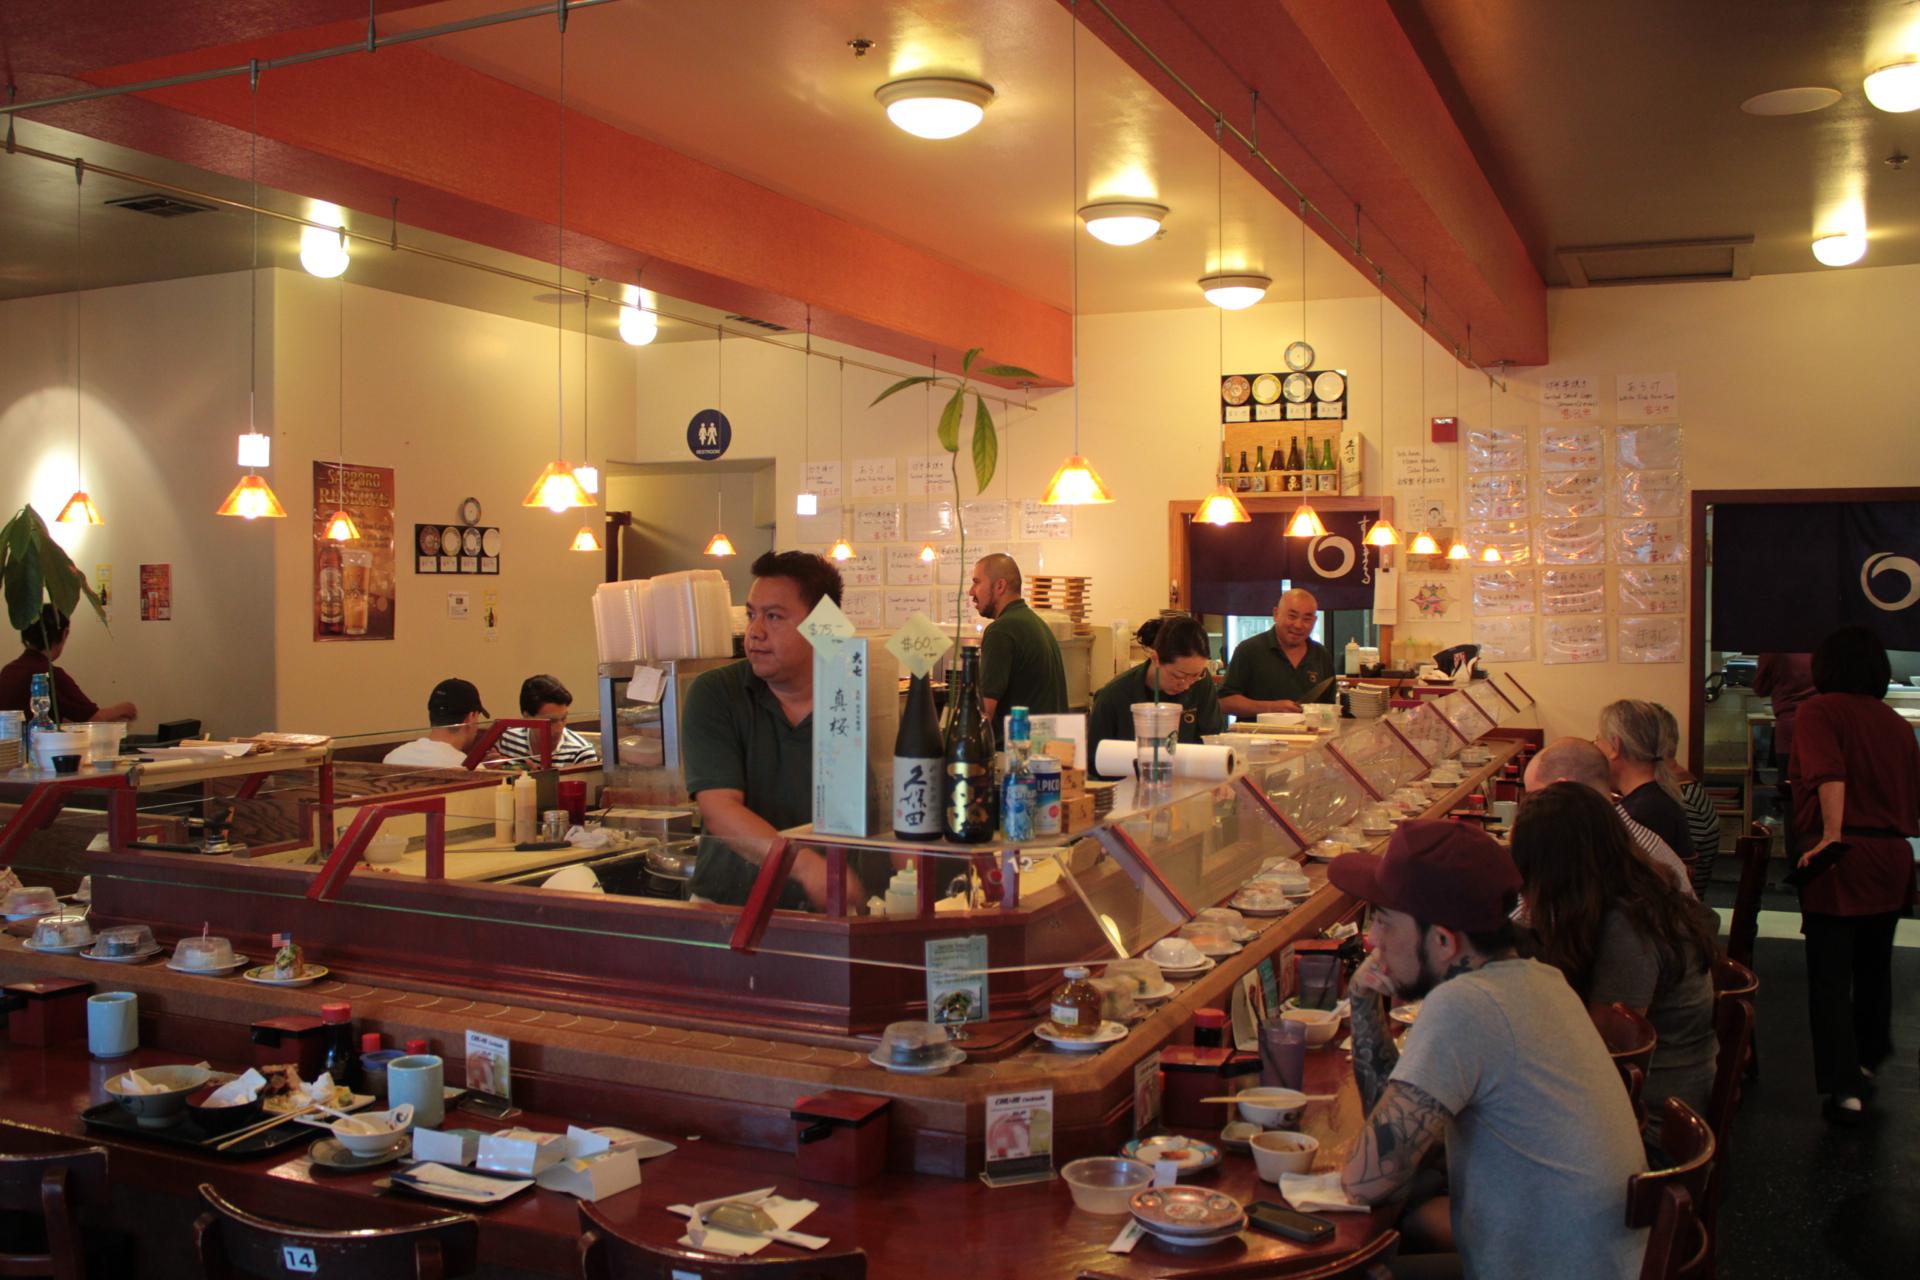 The Sushi Bar At Maru Jeff Cianci